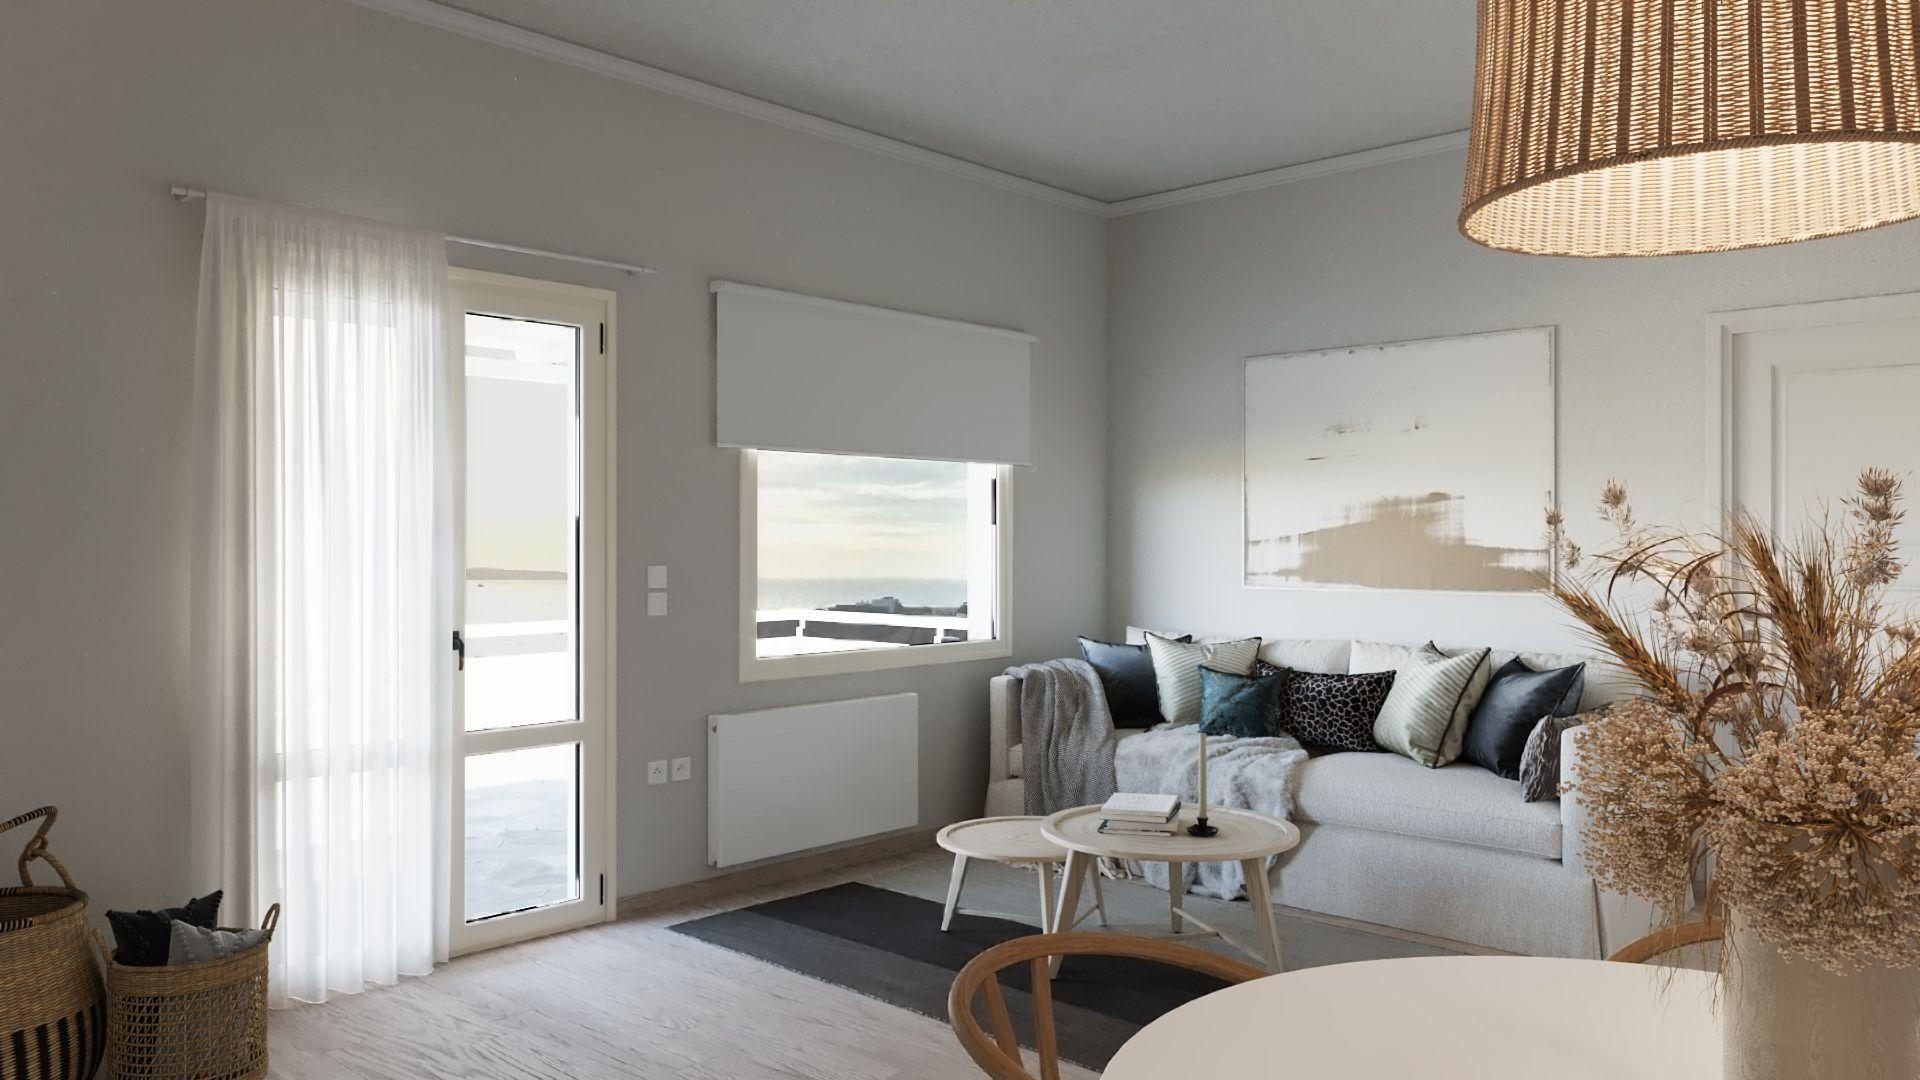 The View Aria Mykonos Suites